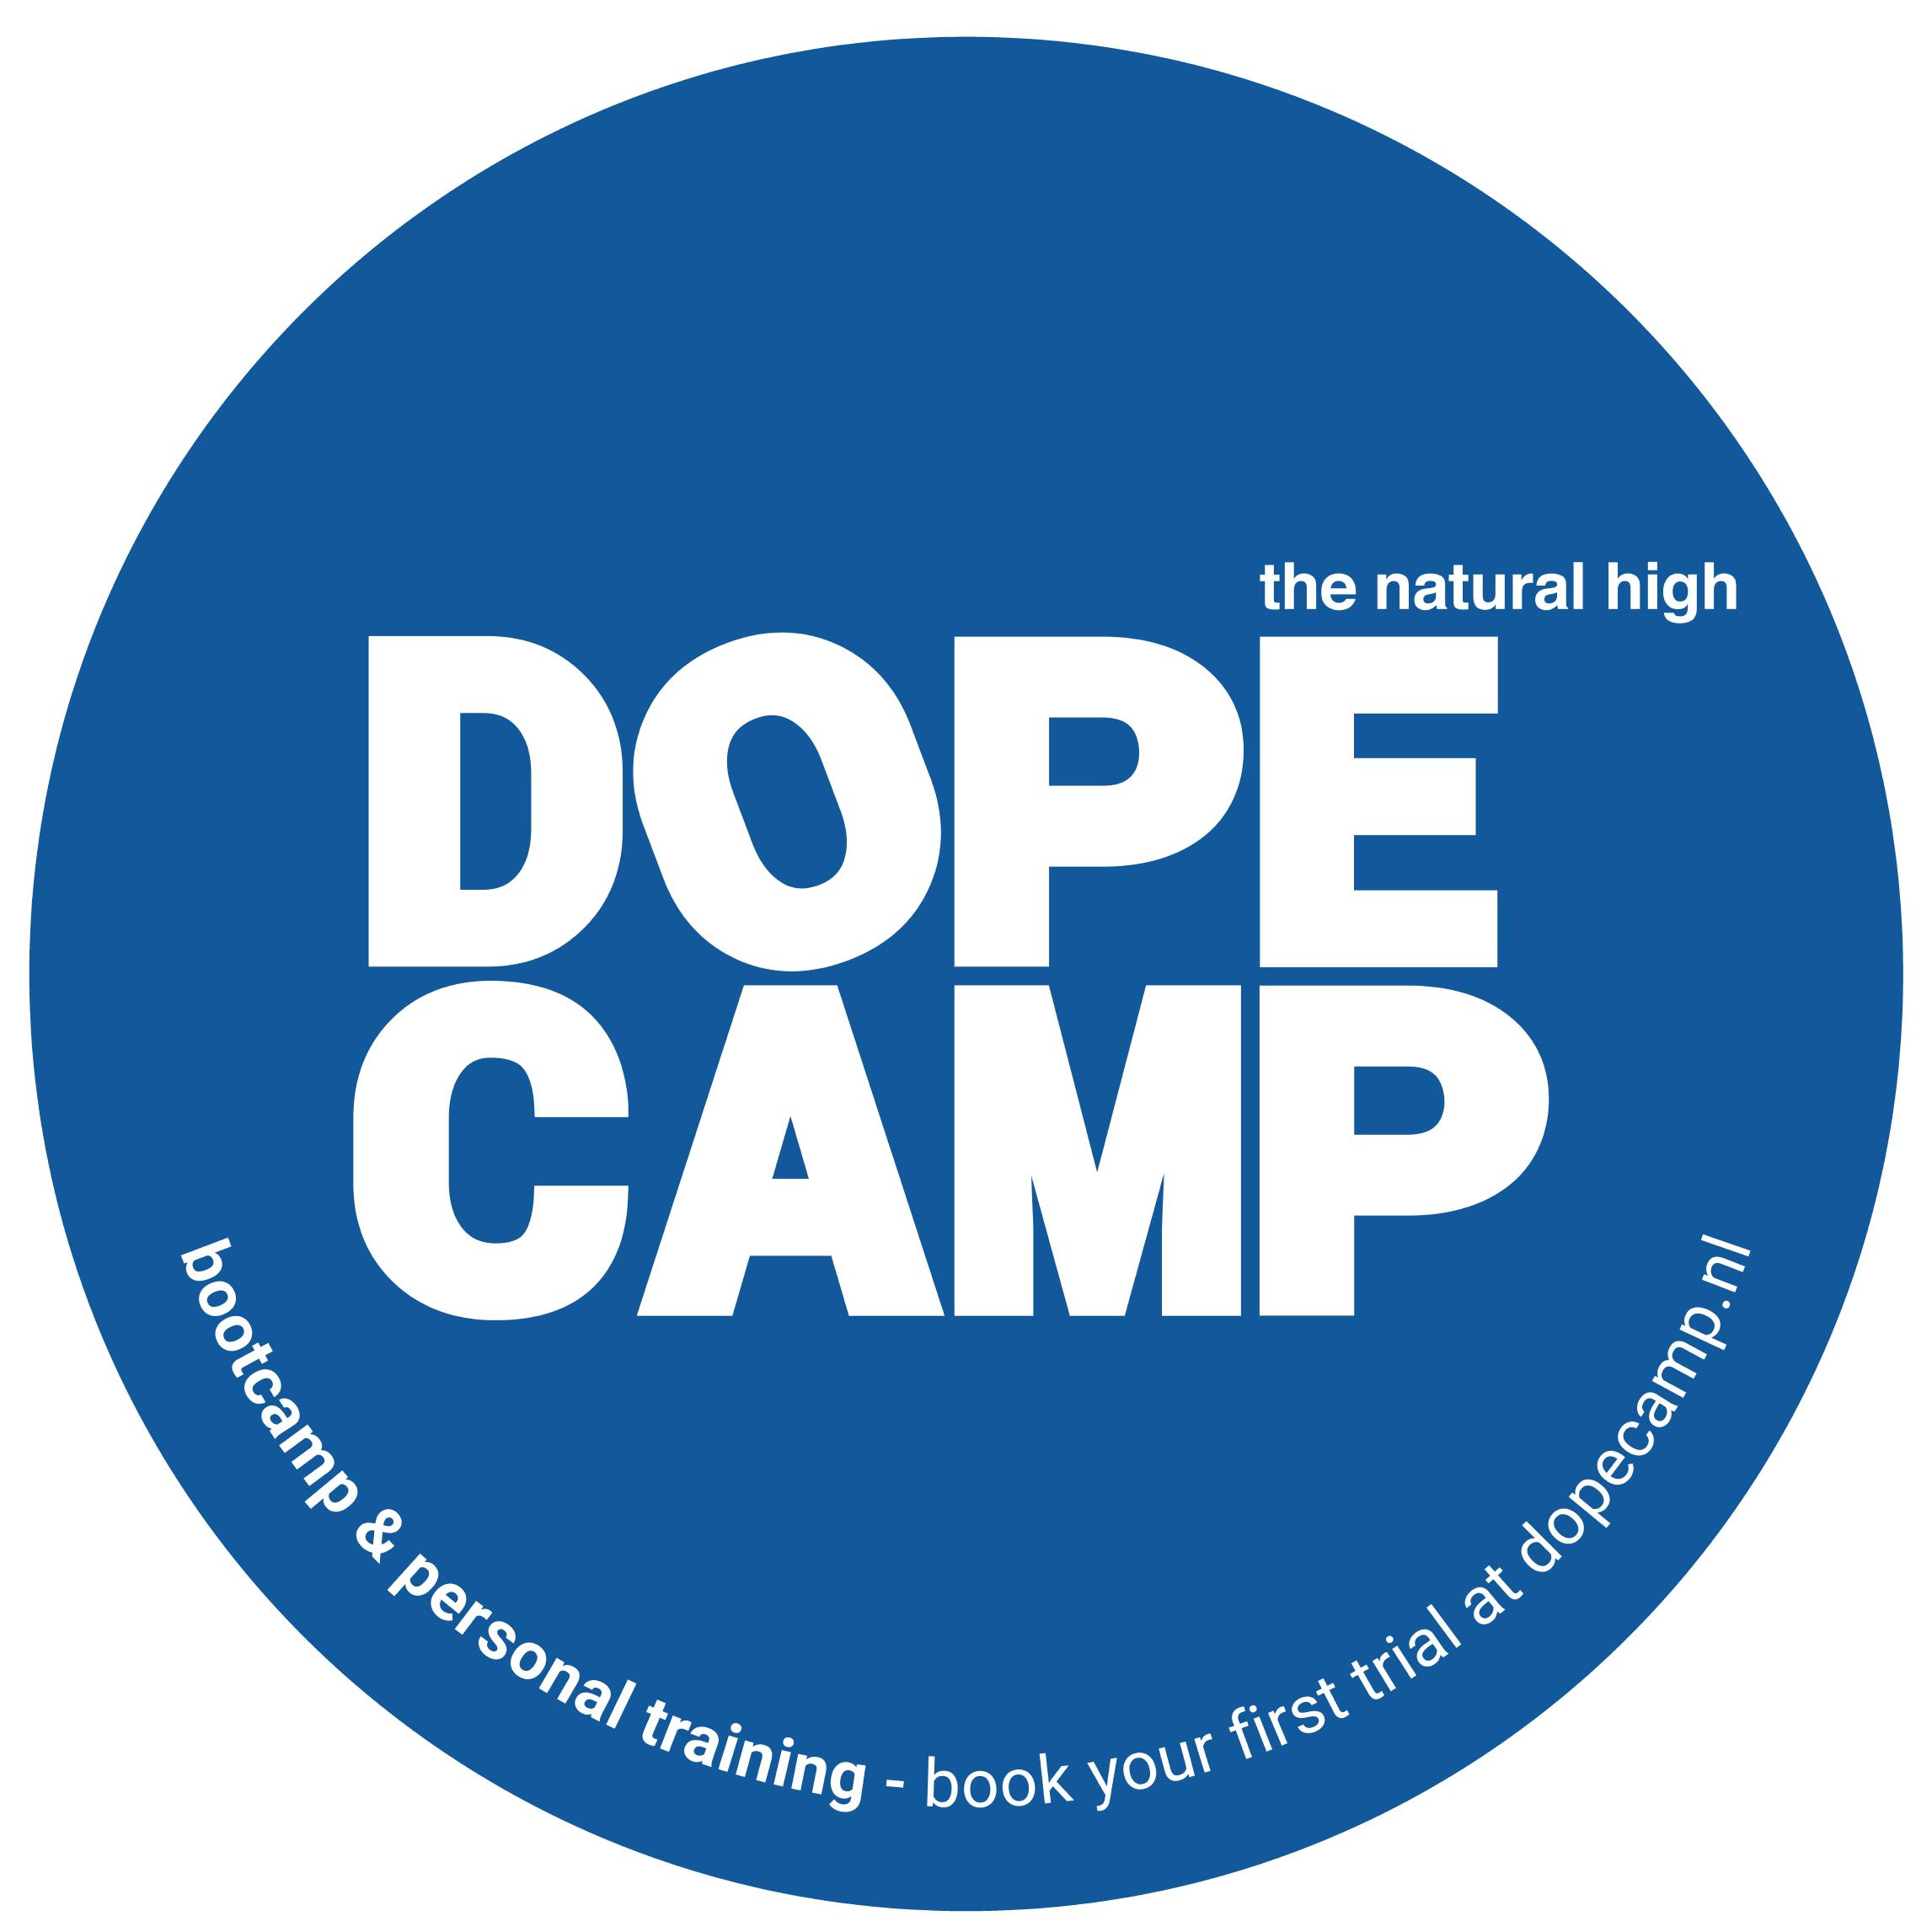 Dope Camp